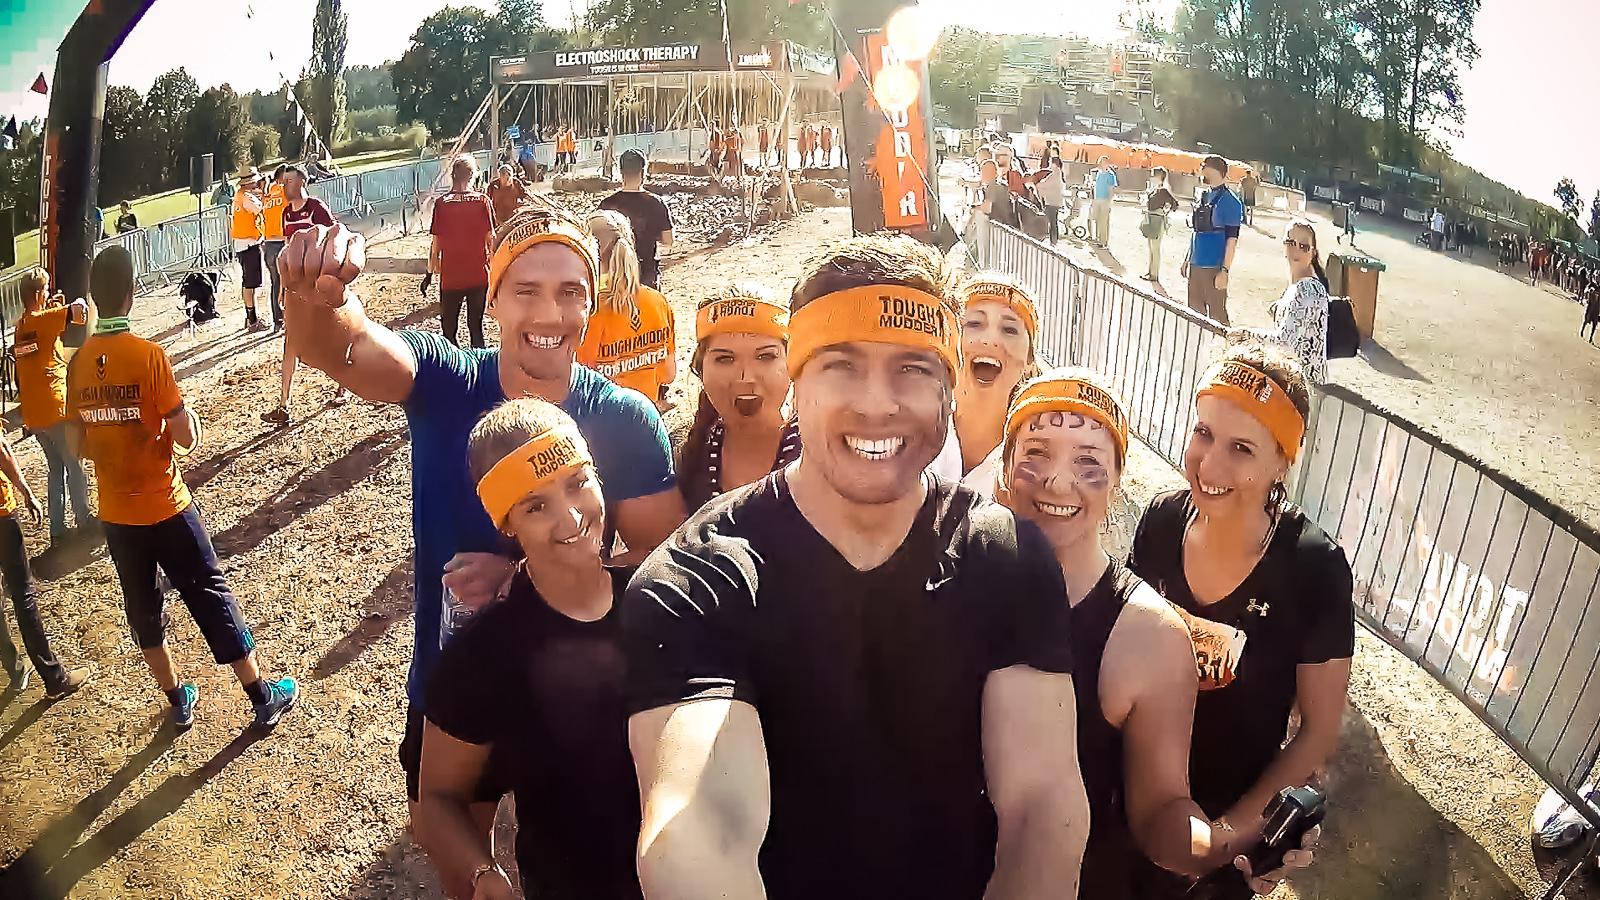 fitnessblog-fitnessblogger-fitness-blog-blogger-stuttgart-dreamteamfitness-tough-mudder-3